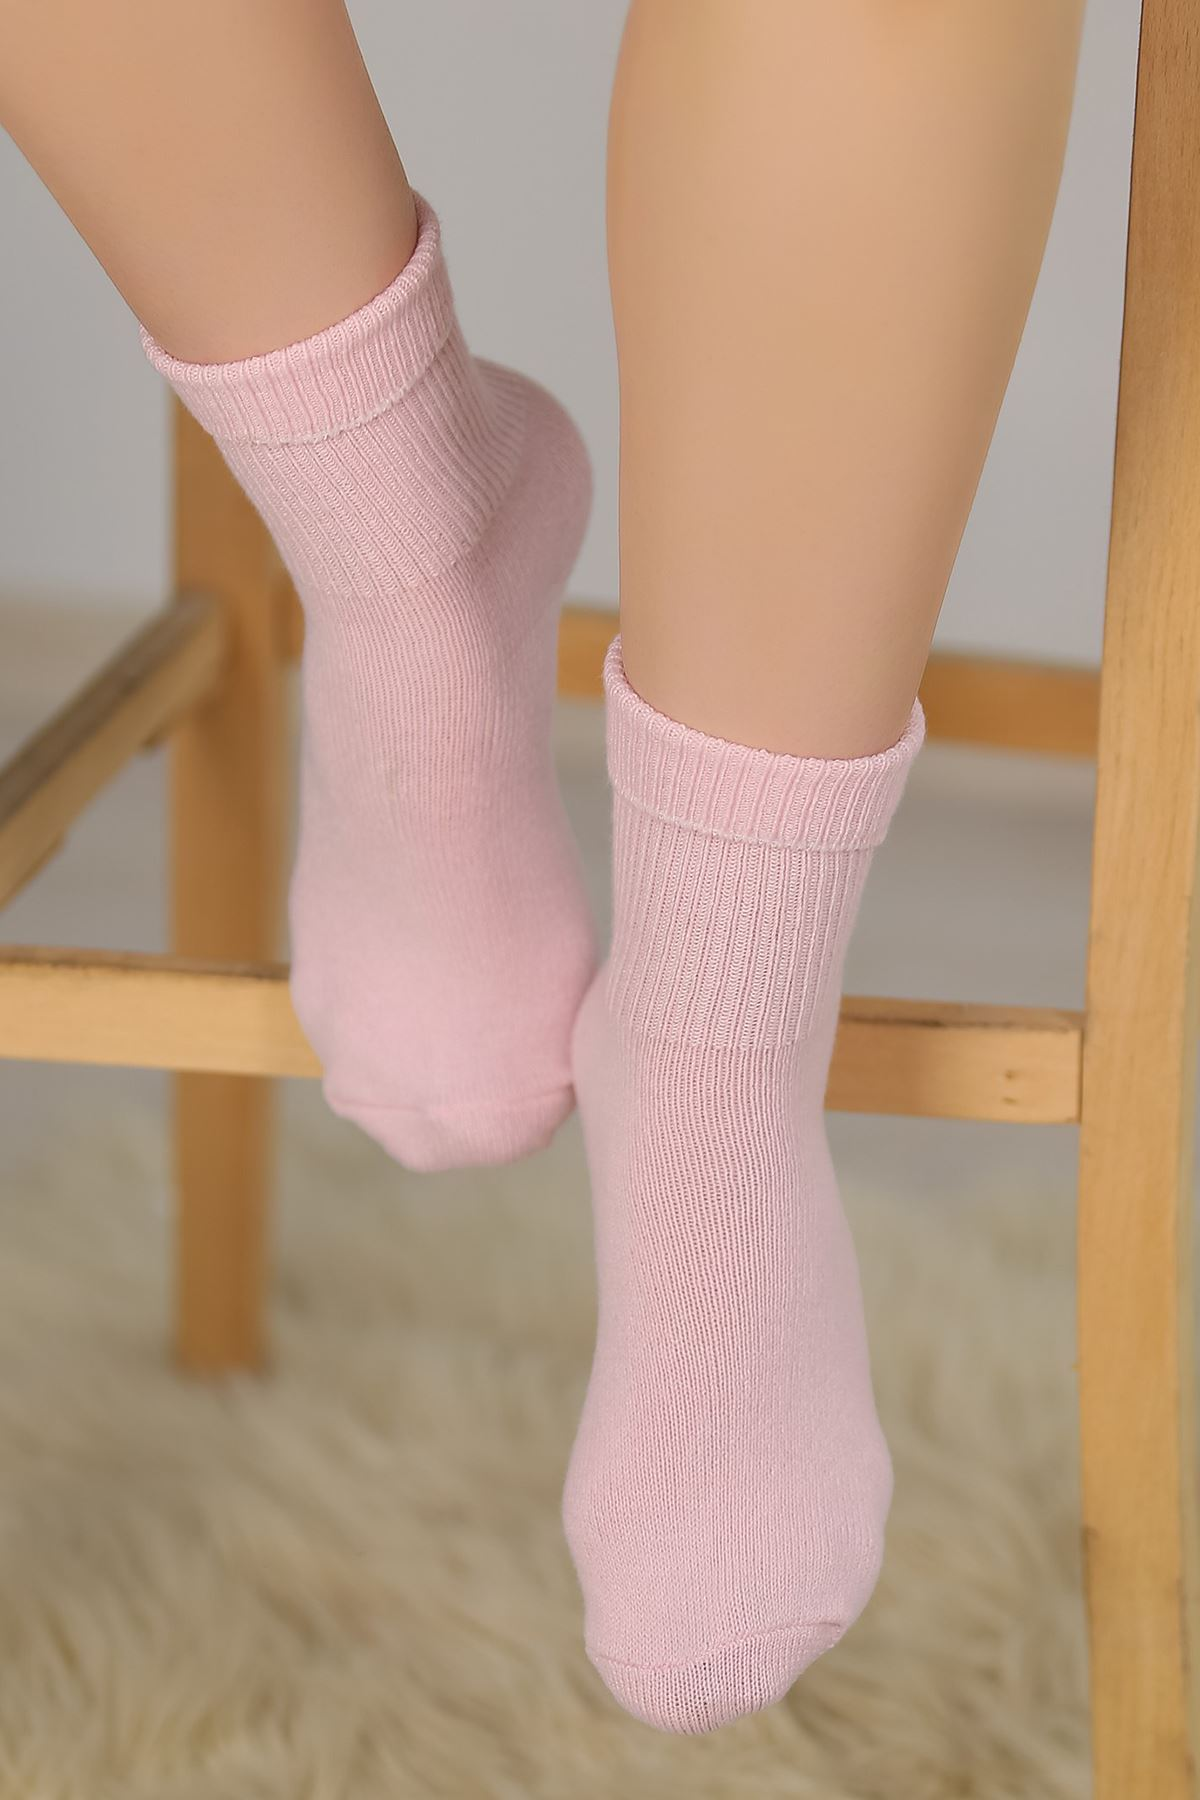 Bayan Bot Çorabı Pembe - 48100.1114.